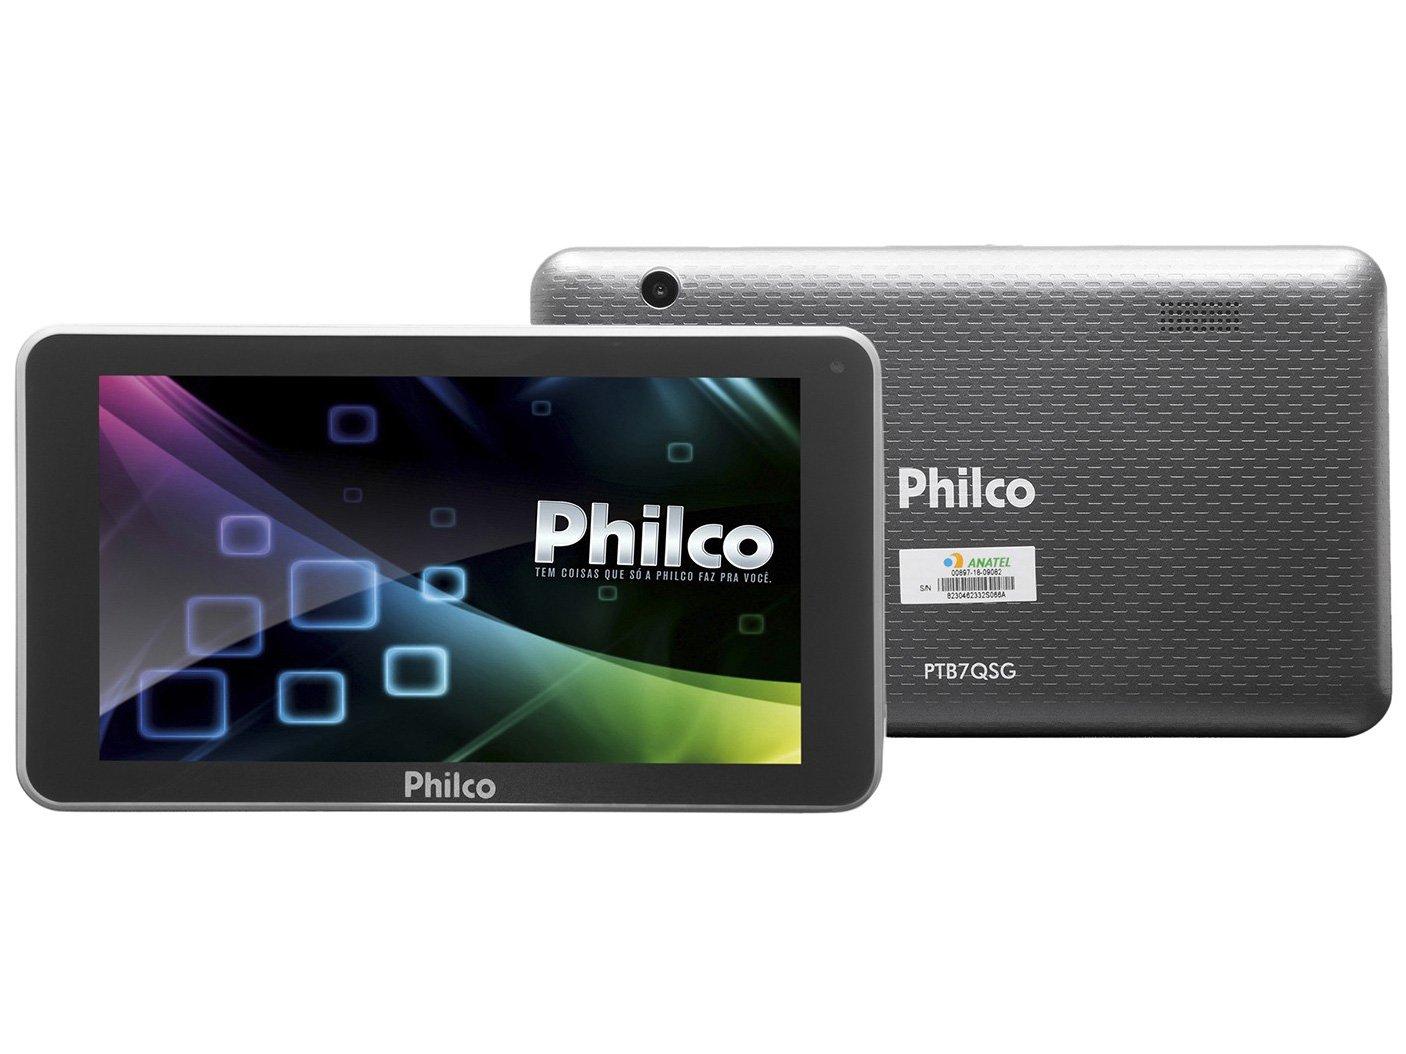 Foto 1 - Tablet Philco PTB7QSG 8GB 7 Wi-Fi - Android 7.1.2 Nougat Quad Core